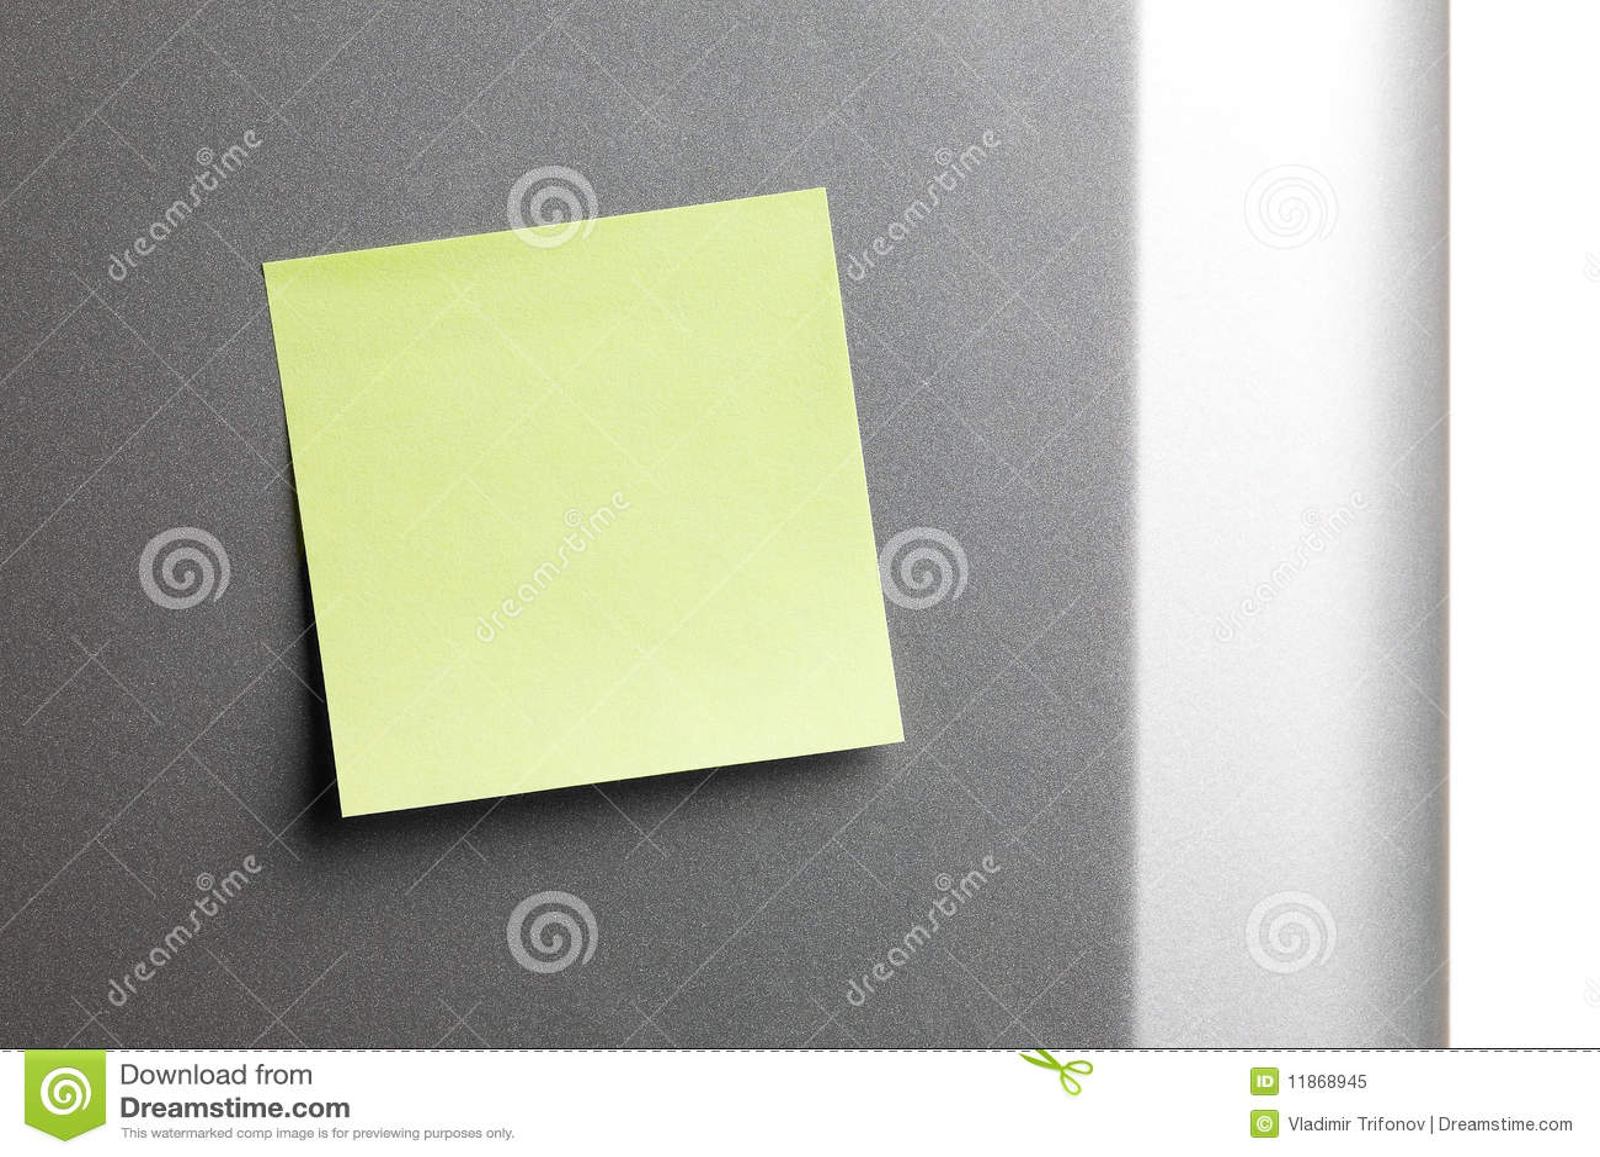 Lege gele sticker op koelkast